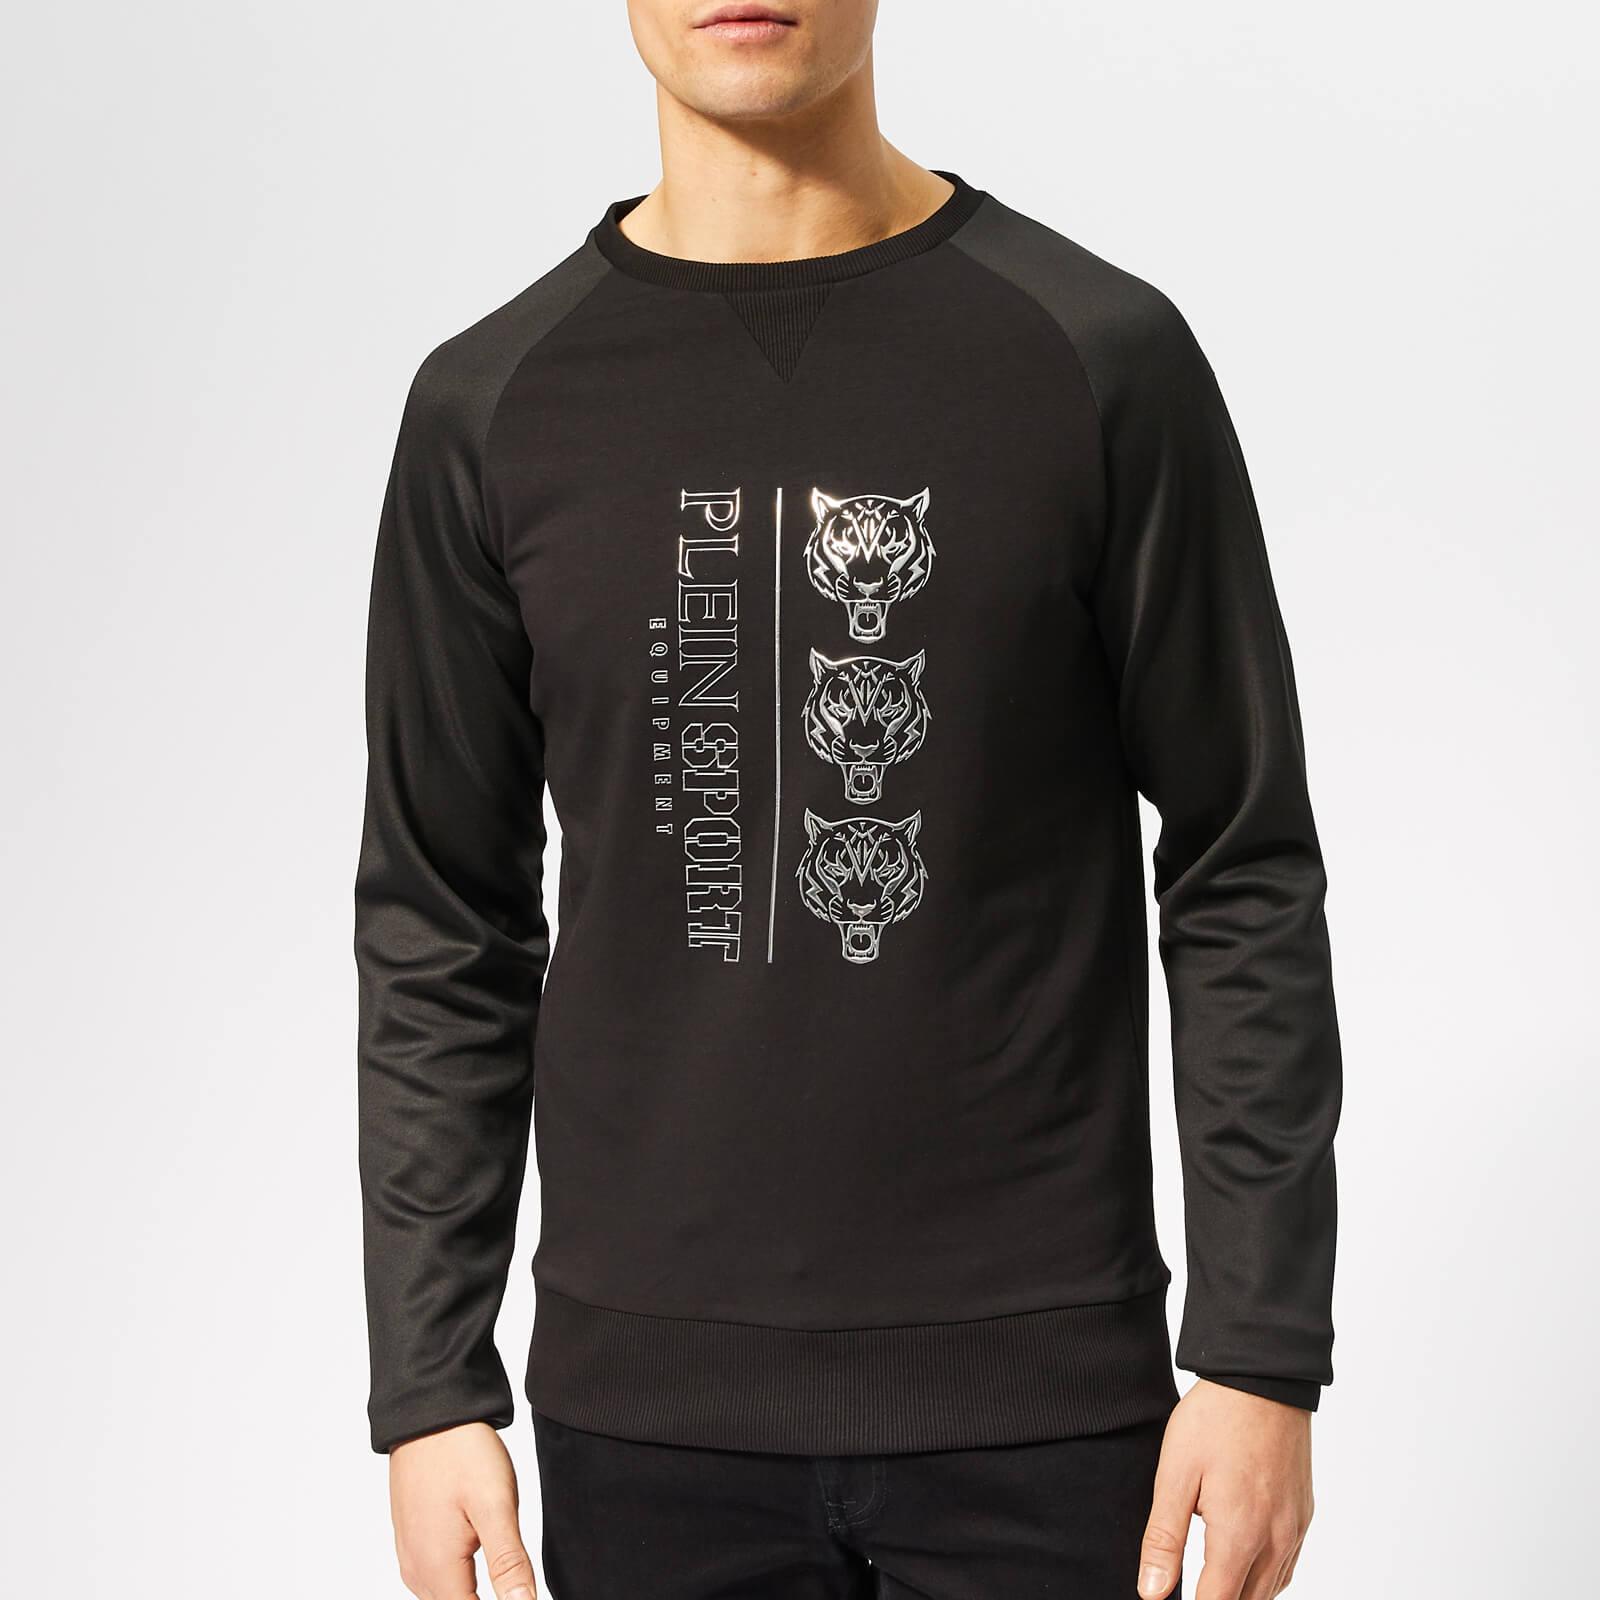 Plein Sport Men's Sweatshirt Long Sleeve Tiger - Black/Silver - L - Black/Silver